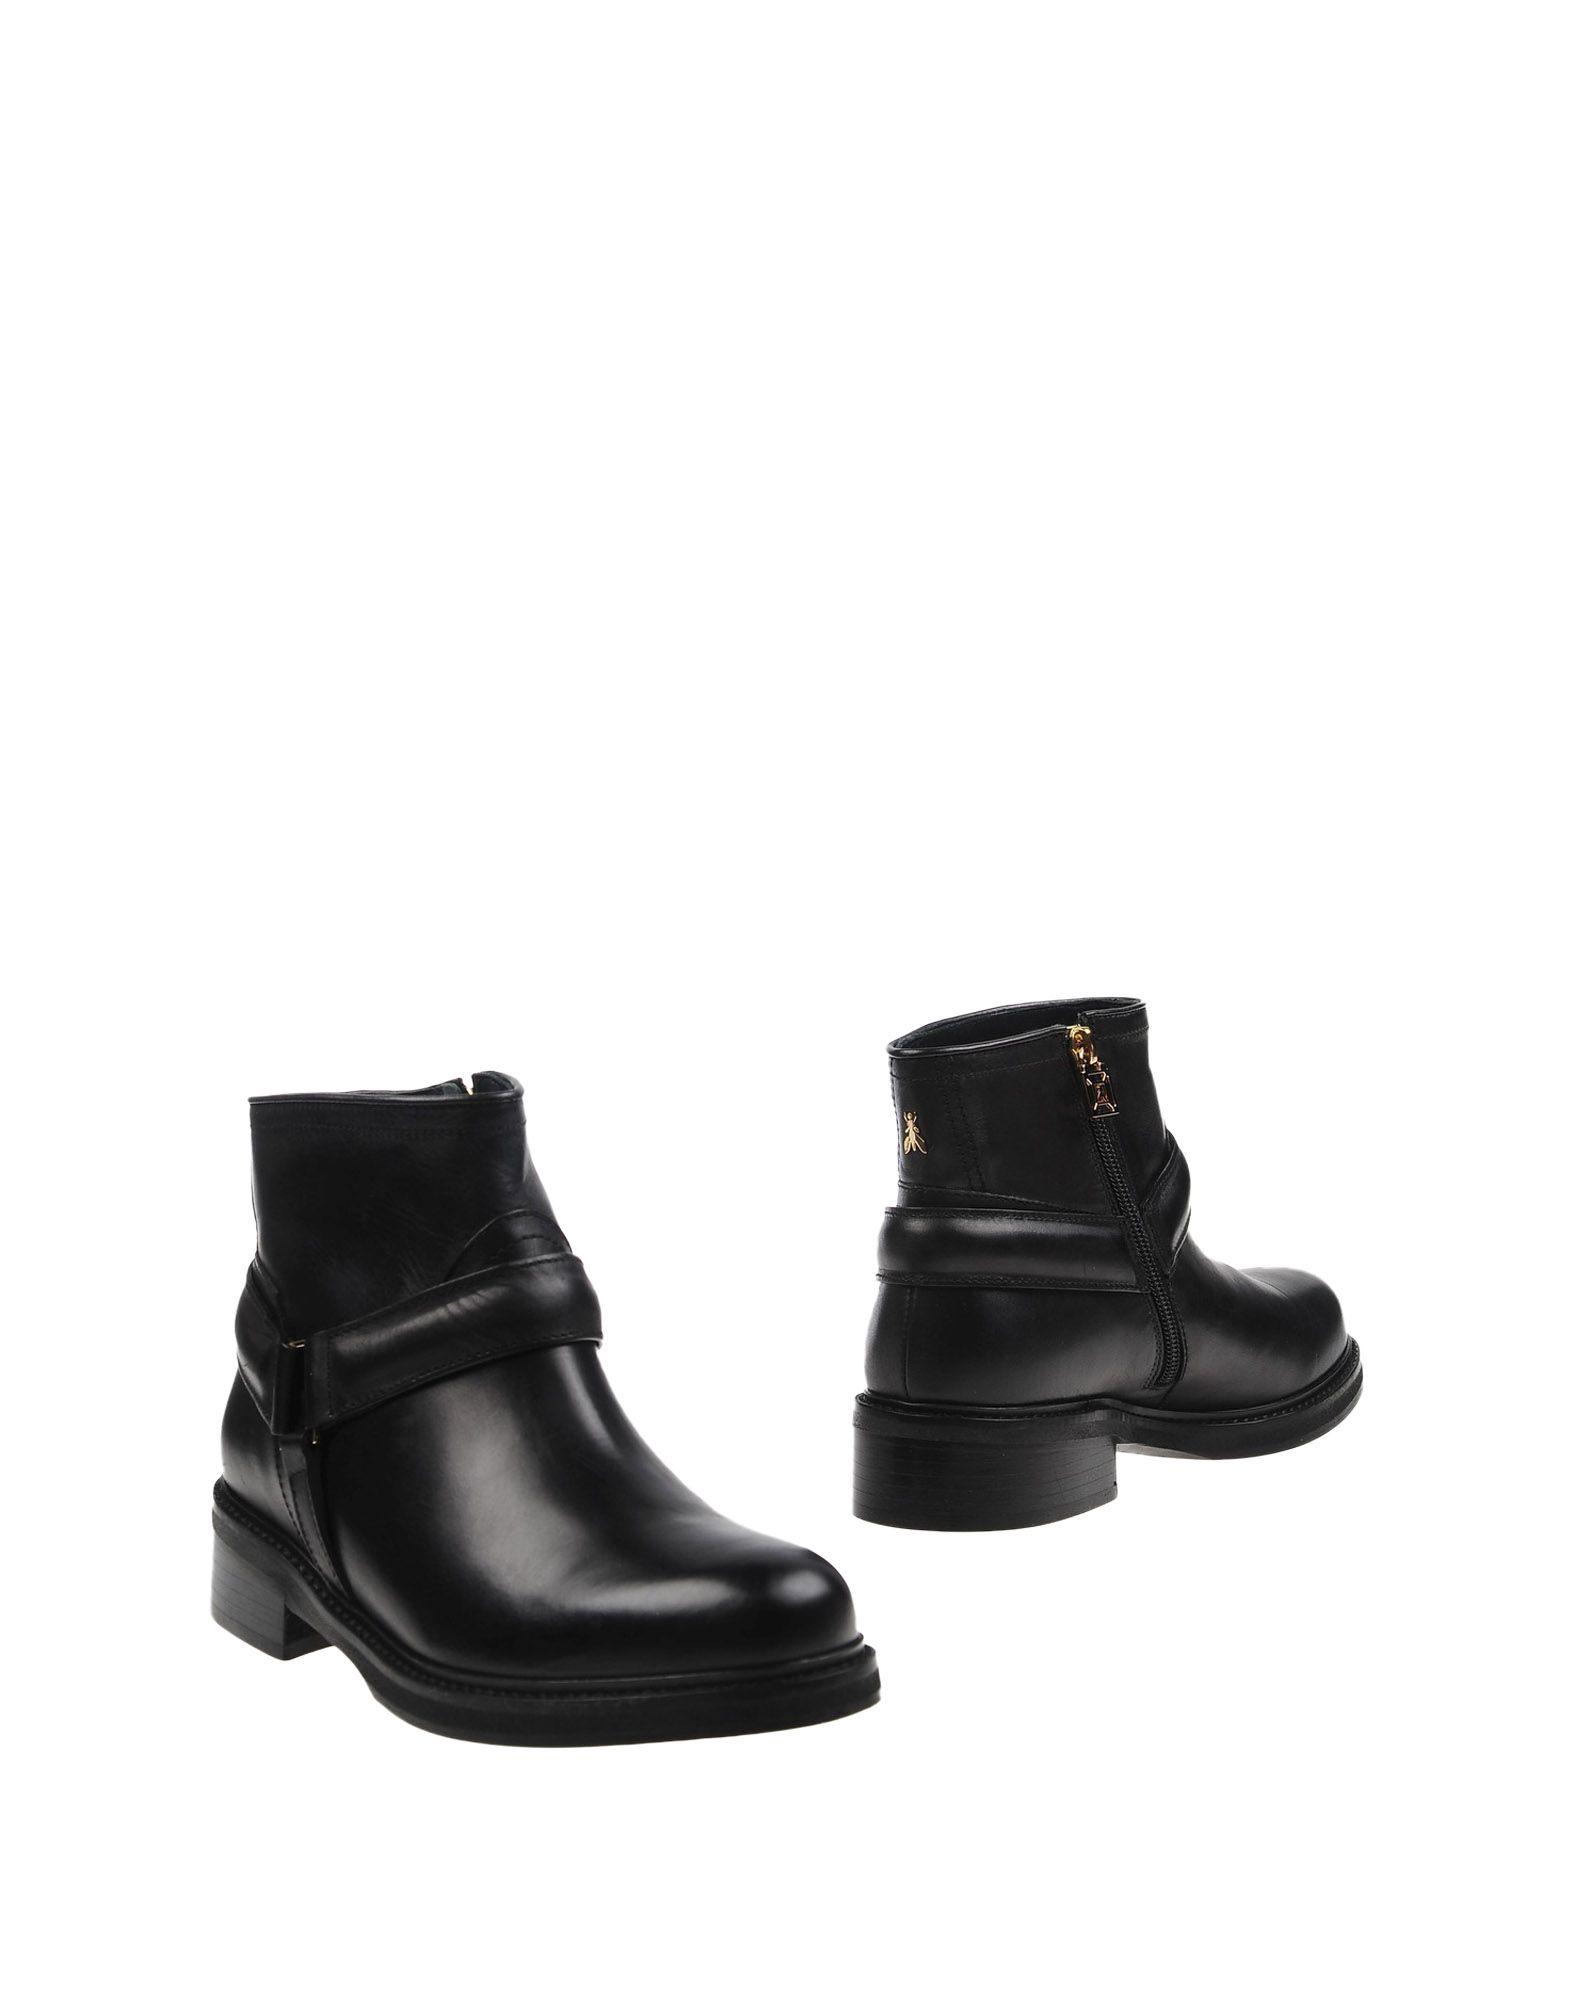 Patrizia Pepe Stiefelette Damen  Schuhe 11297919CFGut aussehende strapazierfähige Schuhe  149ed9